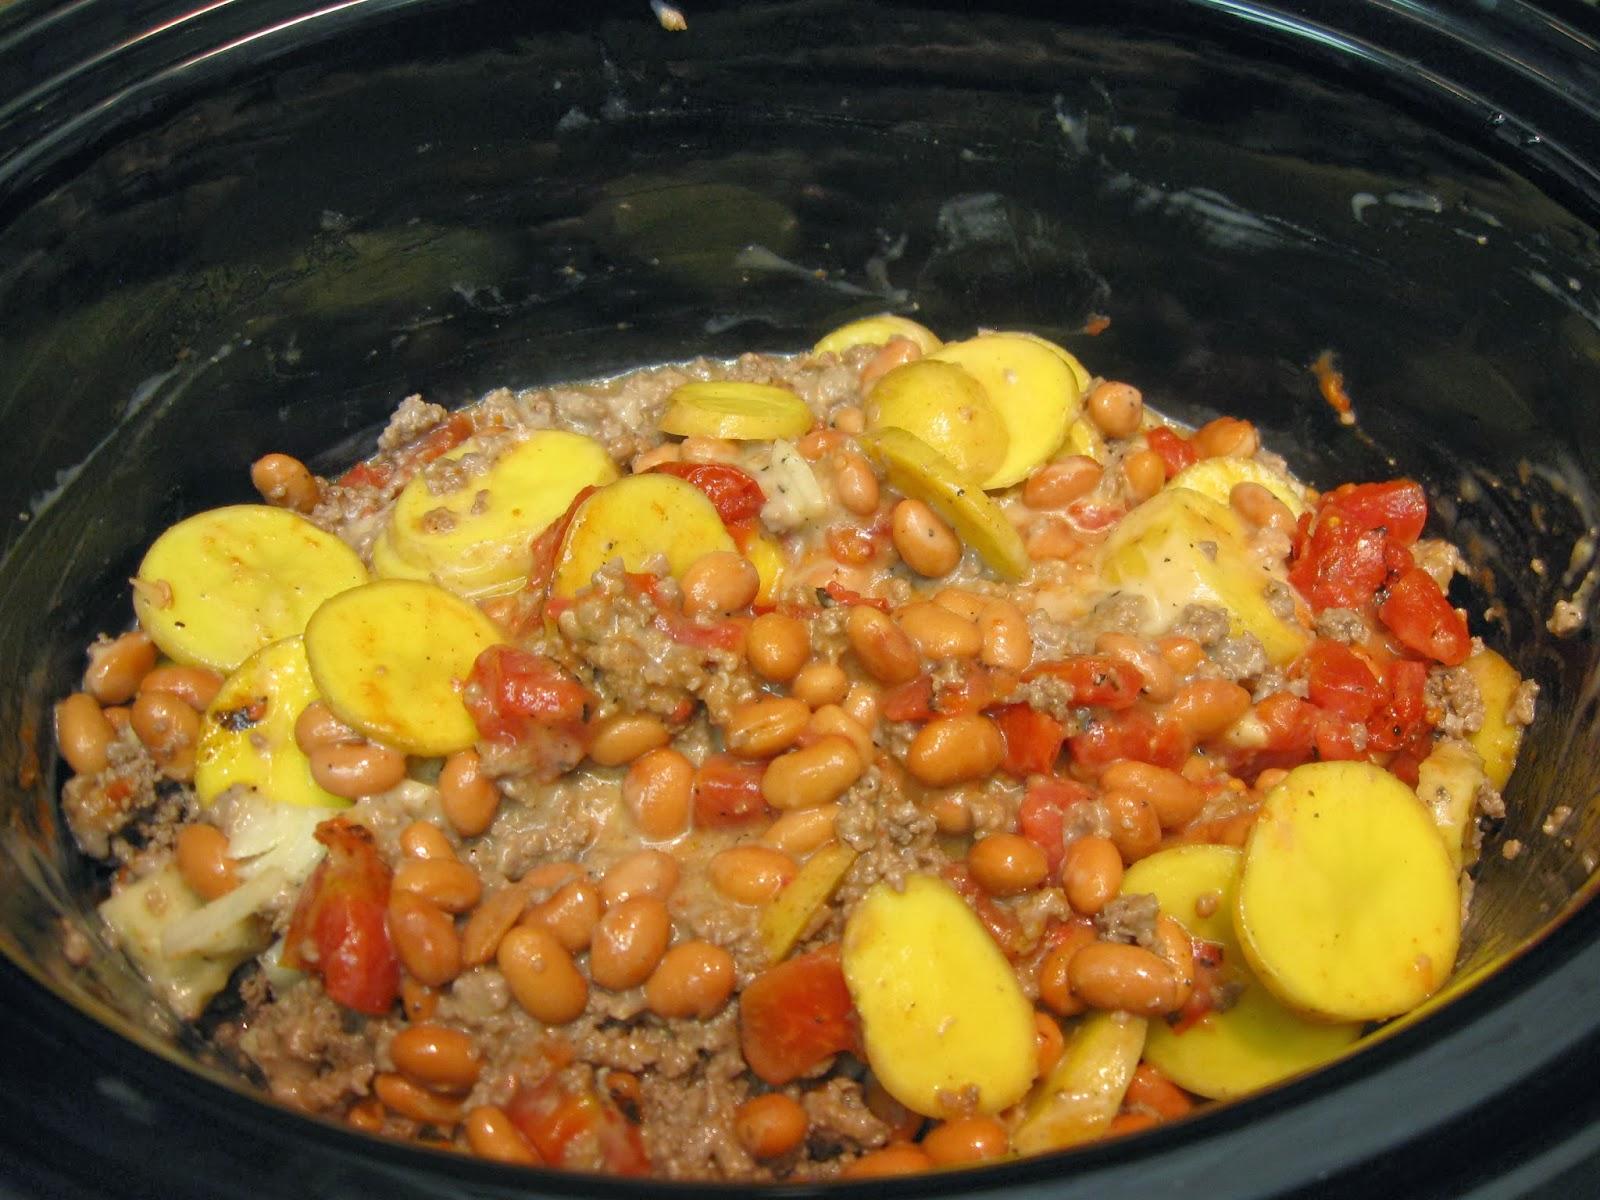 IMG_0298 taste and see god's goodness crockpot cheesy cowboy casserole